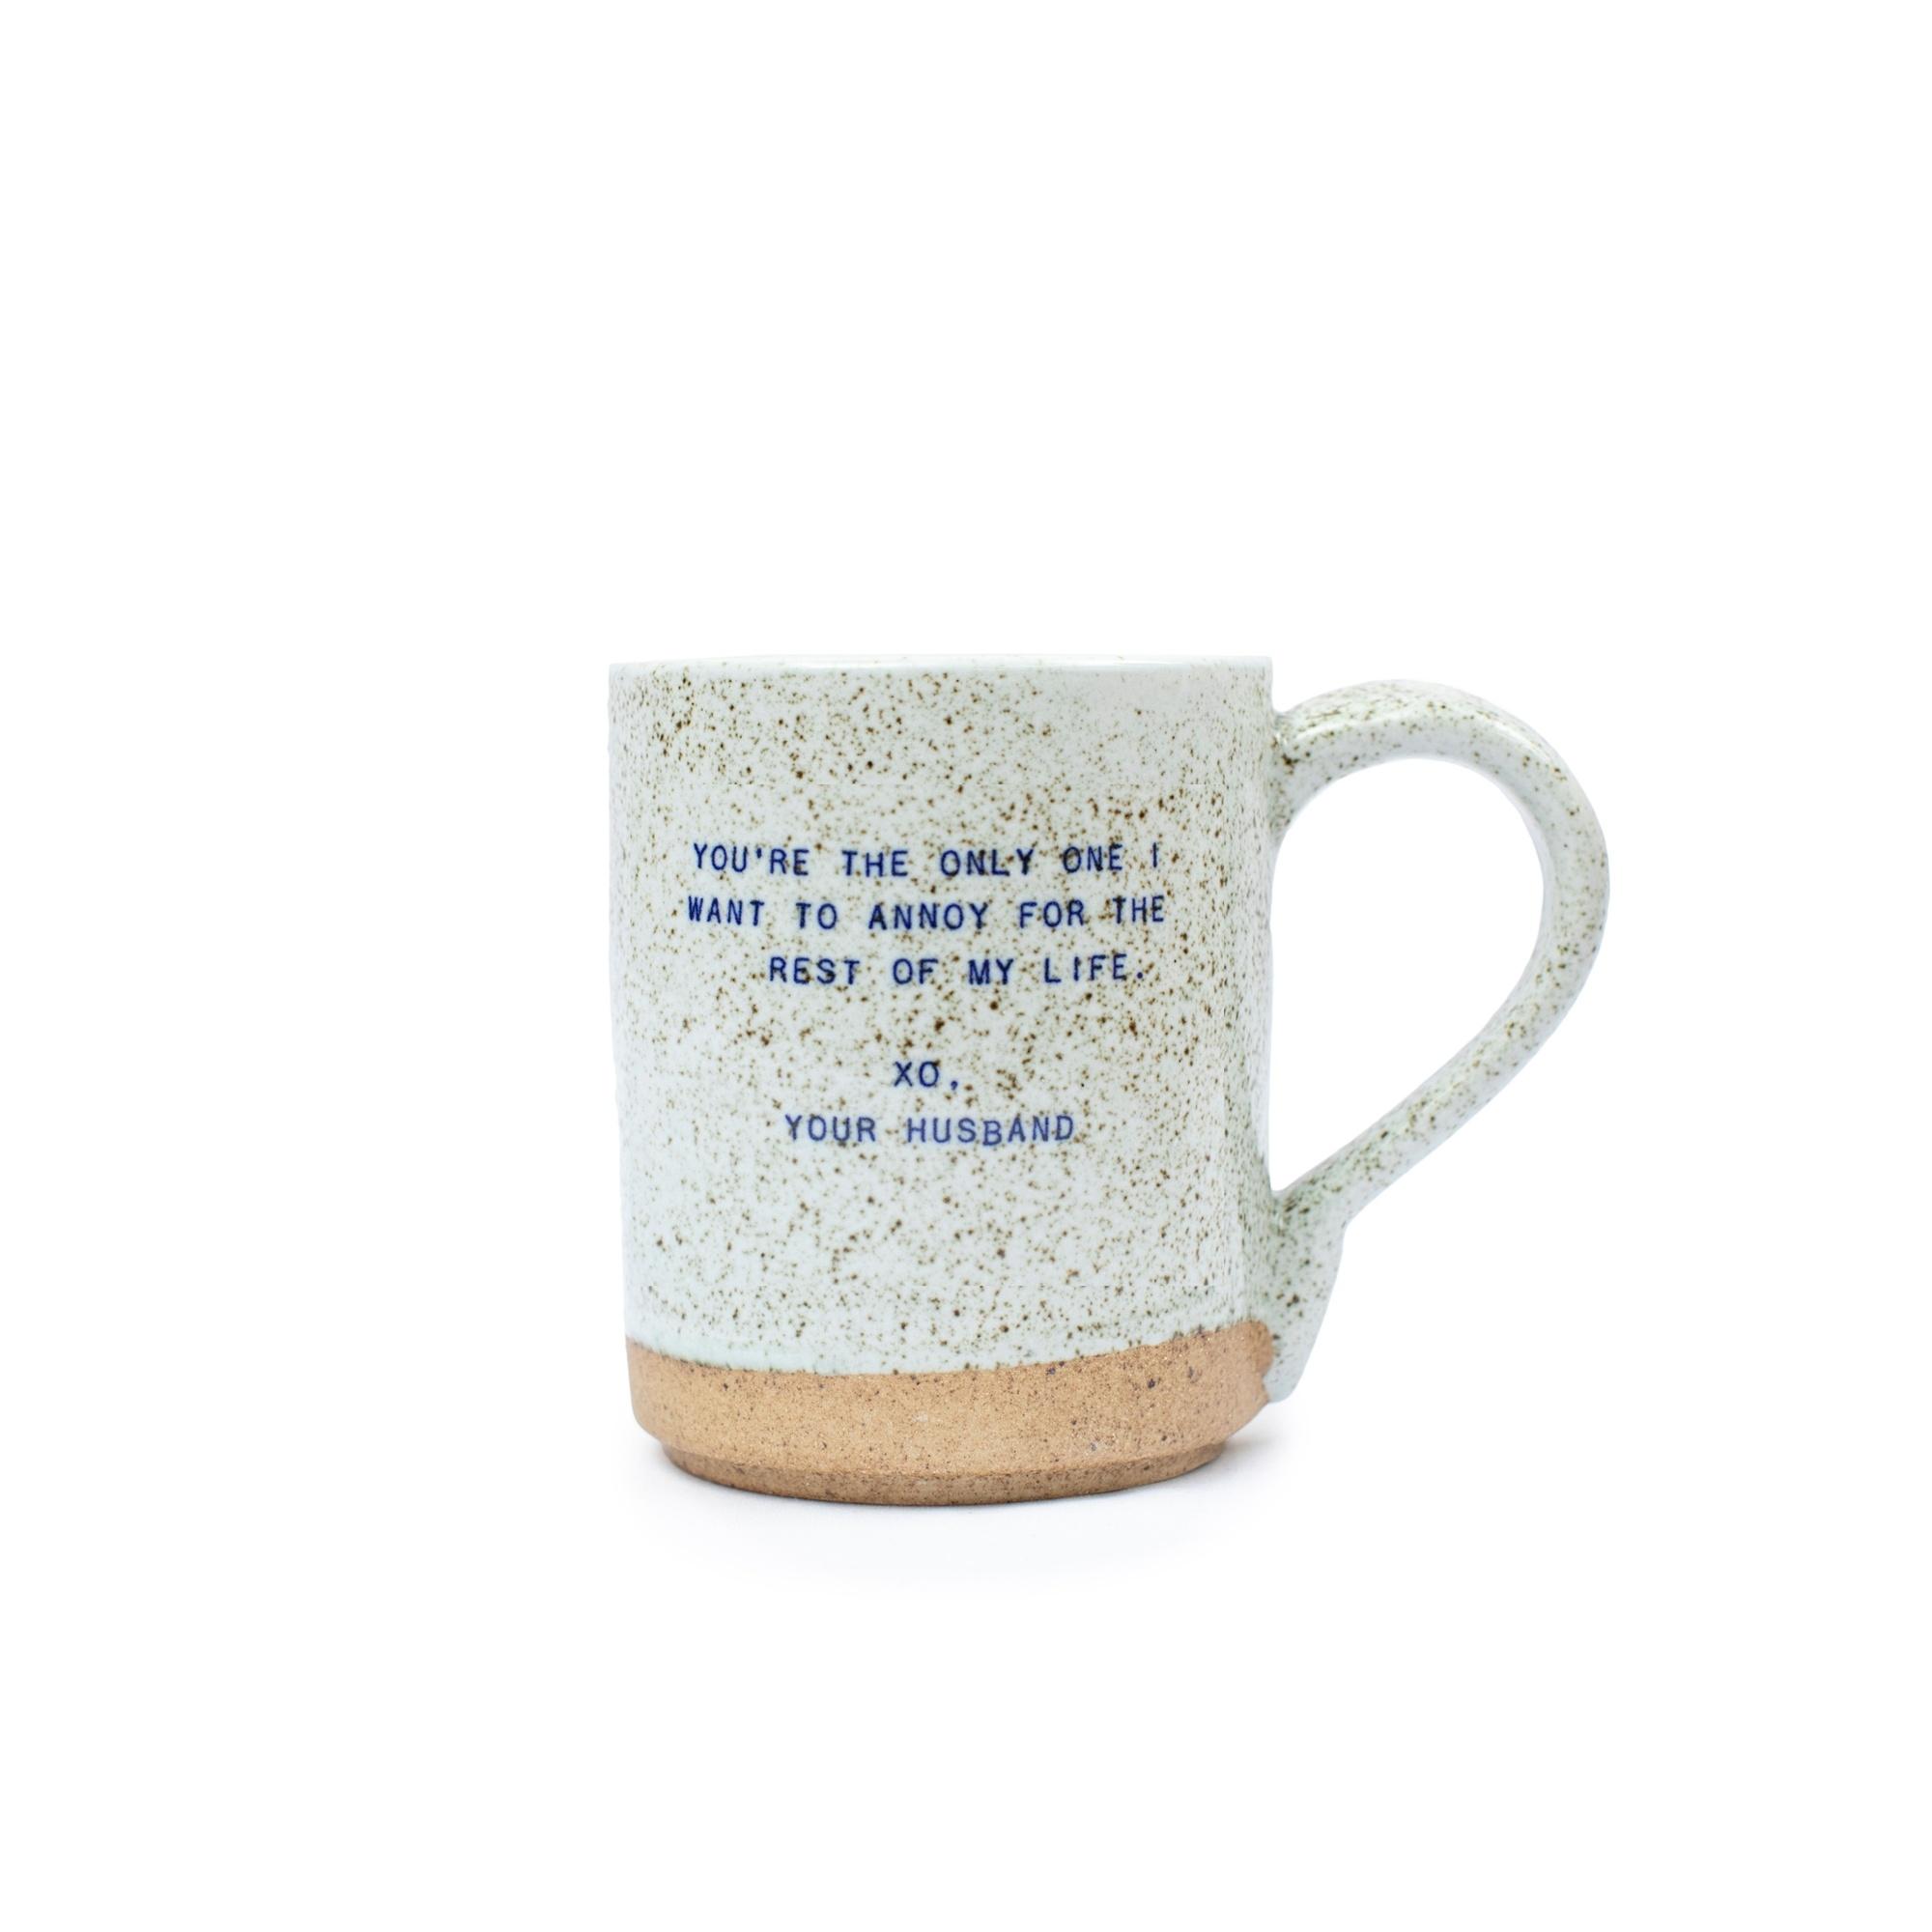 Sugarboo & Co. Sugarboo Mug - Your Husband